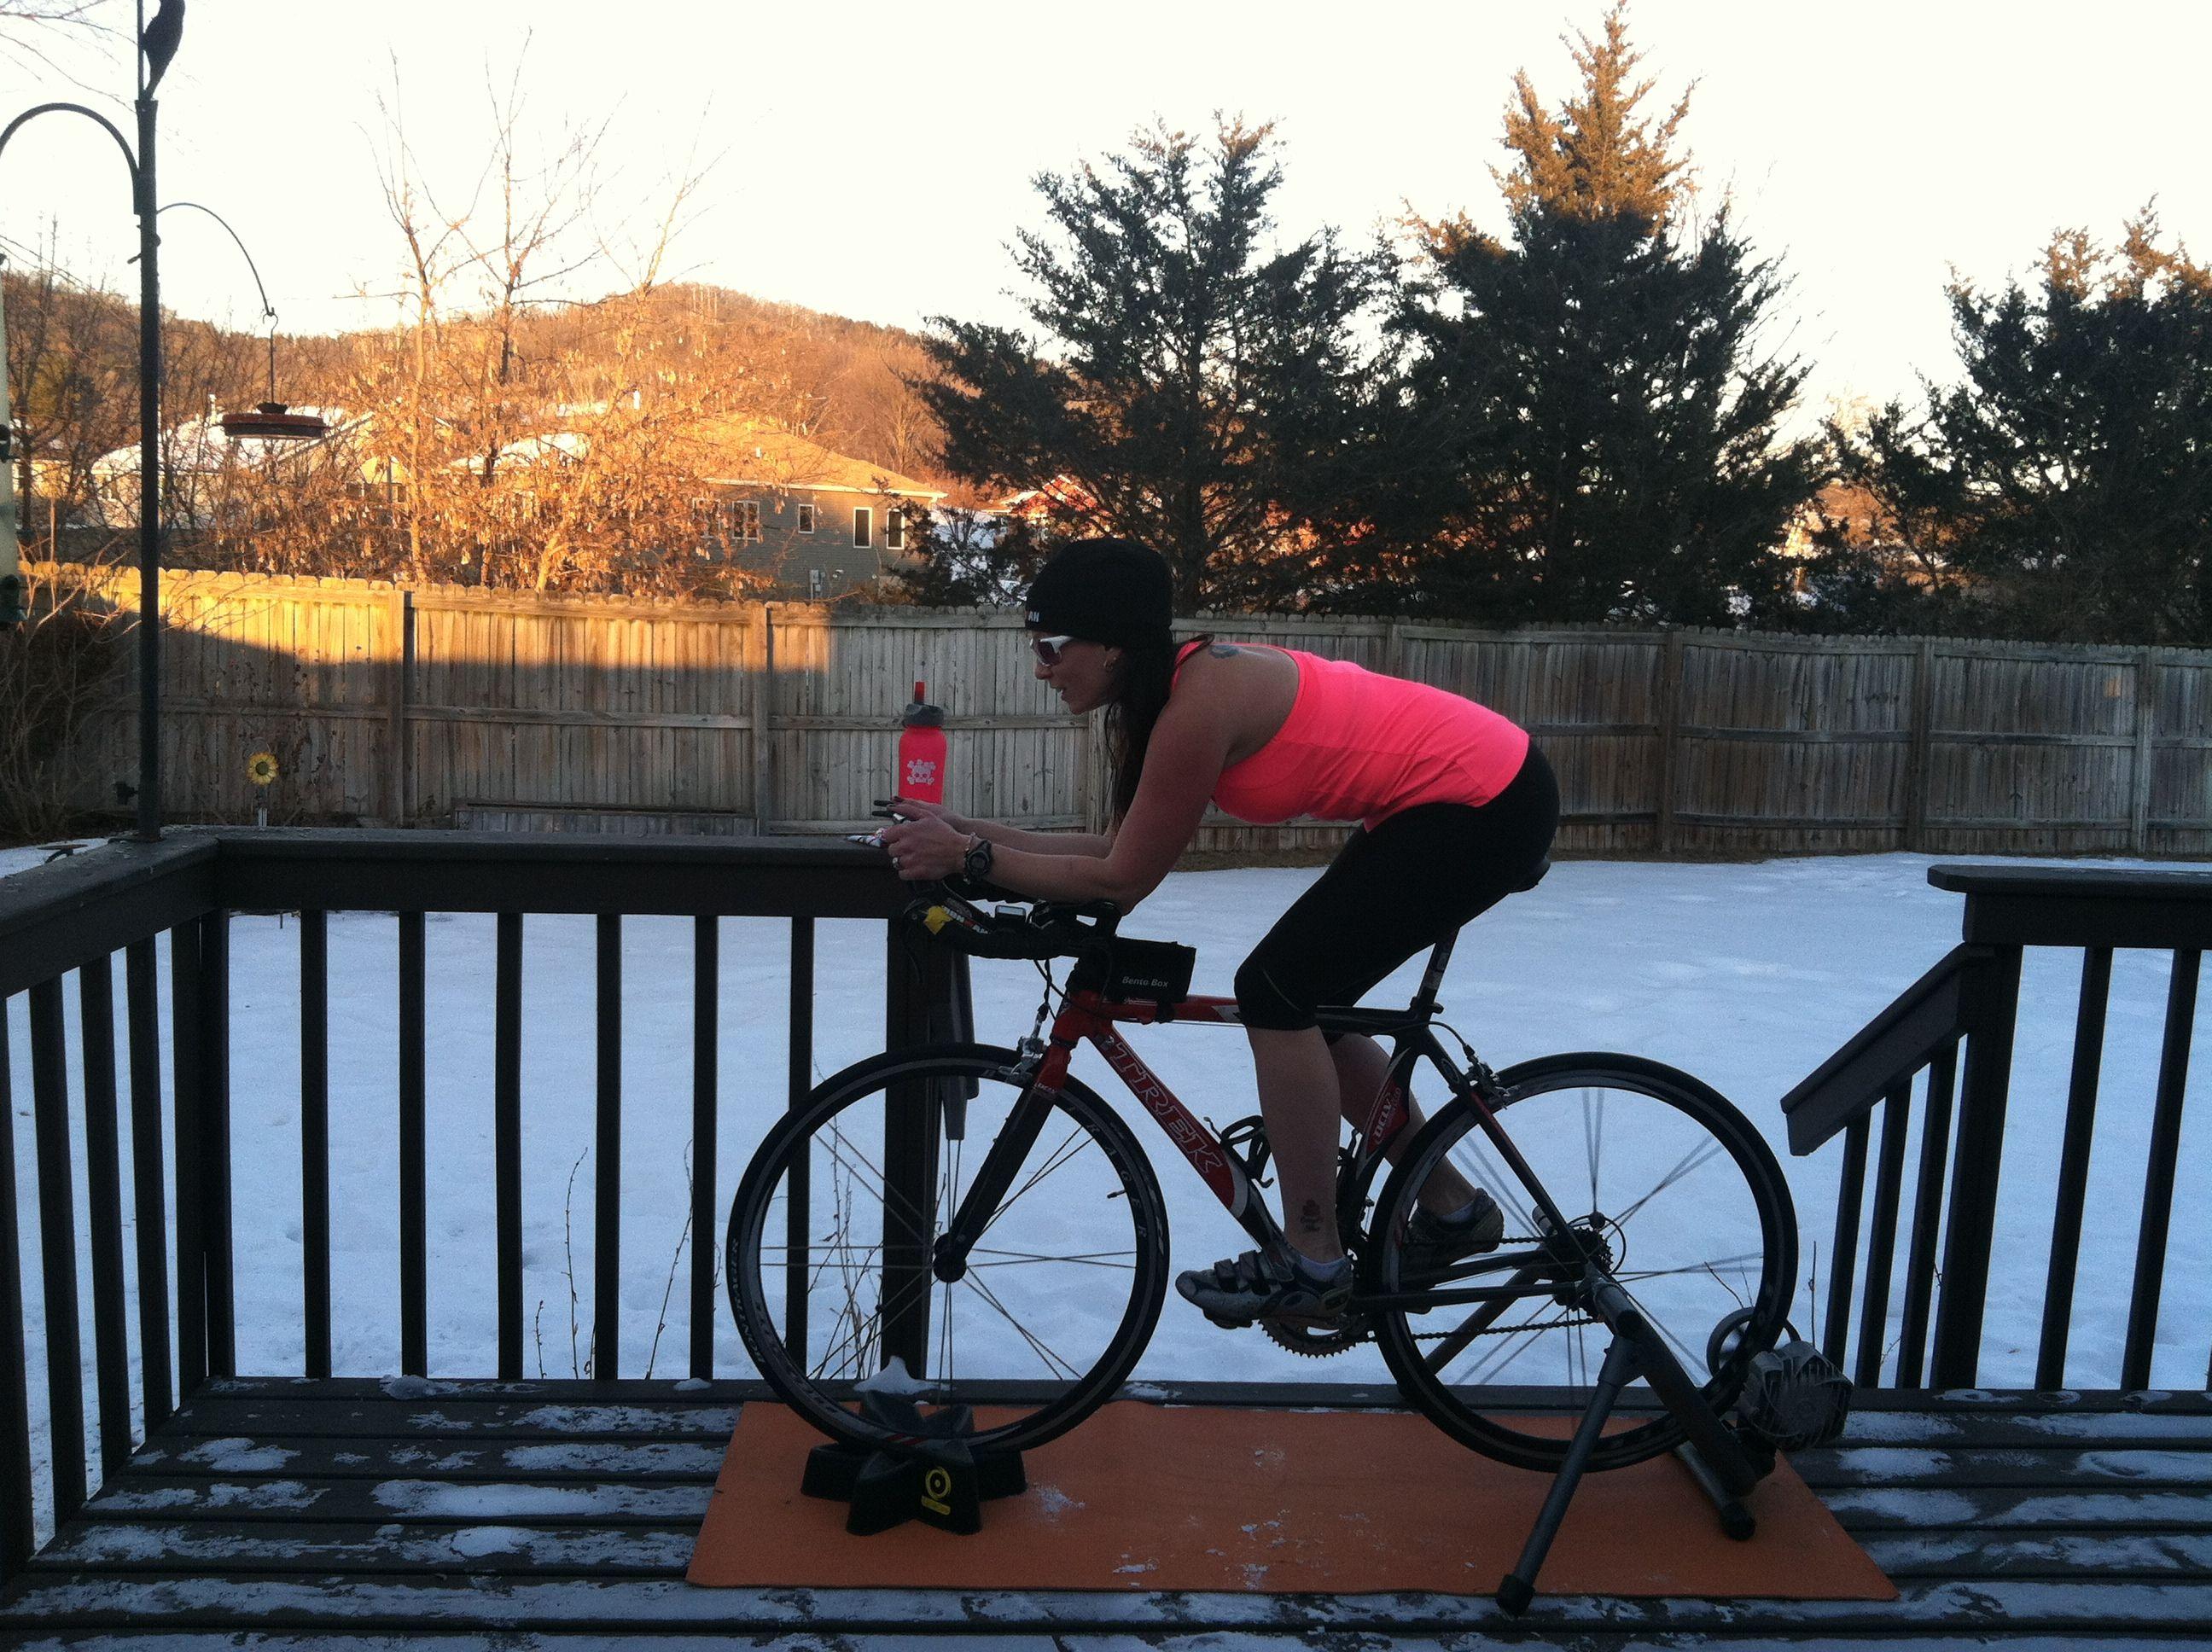 Training For Escape From Alcatraz Triathlon I Heard Your Freezing